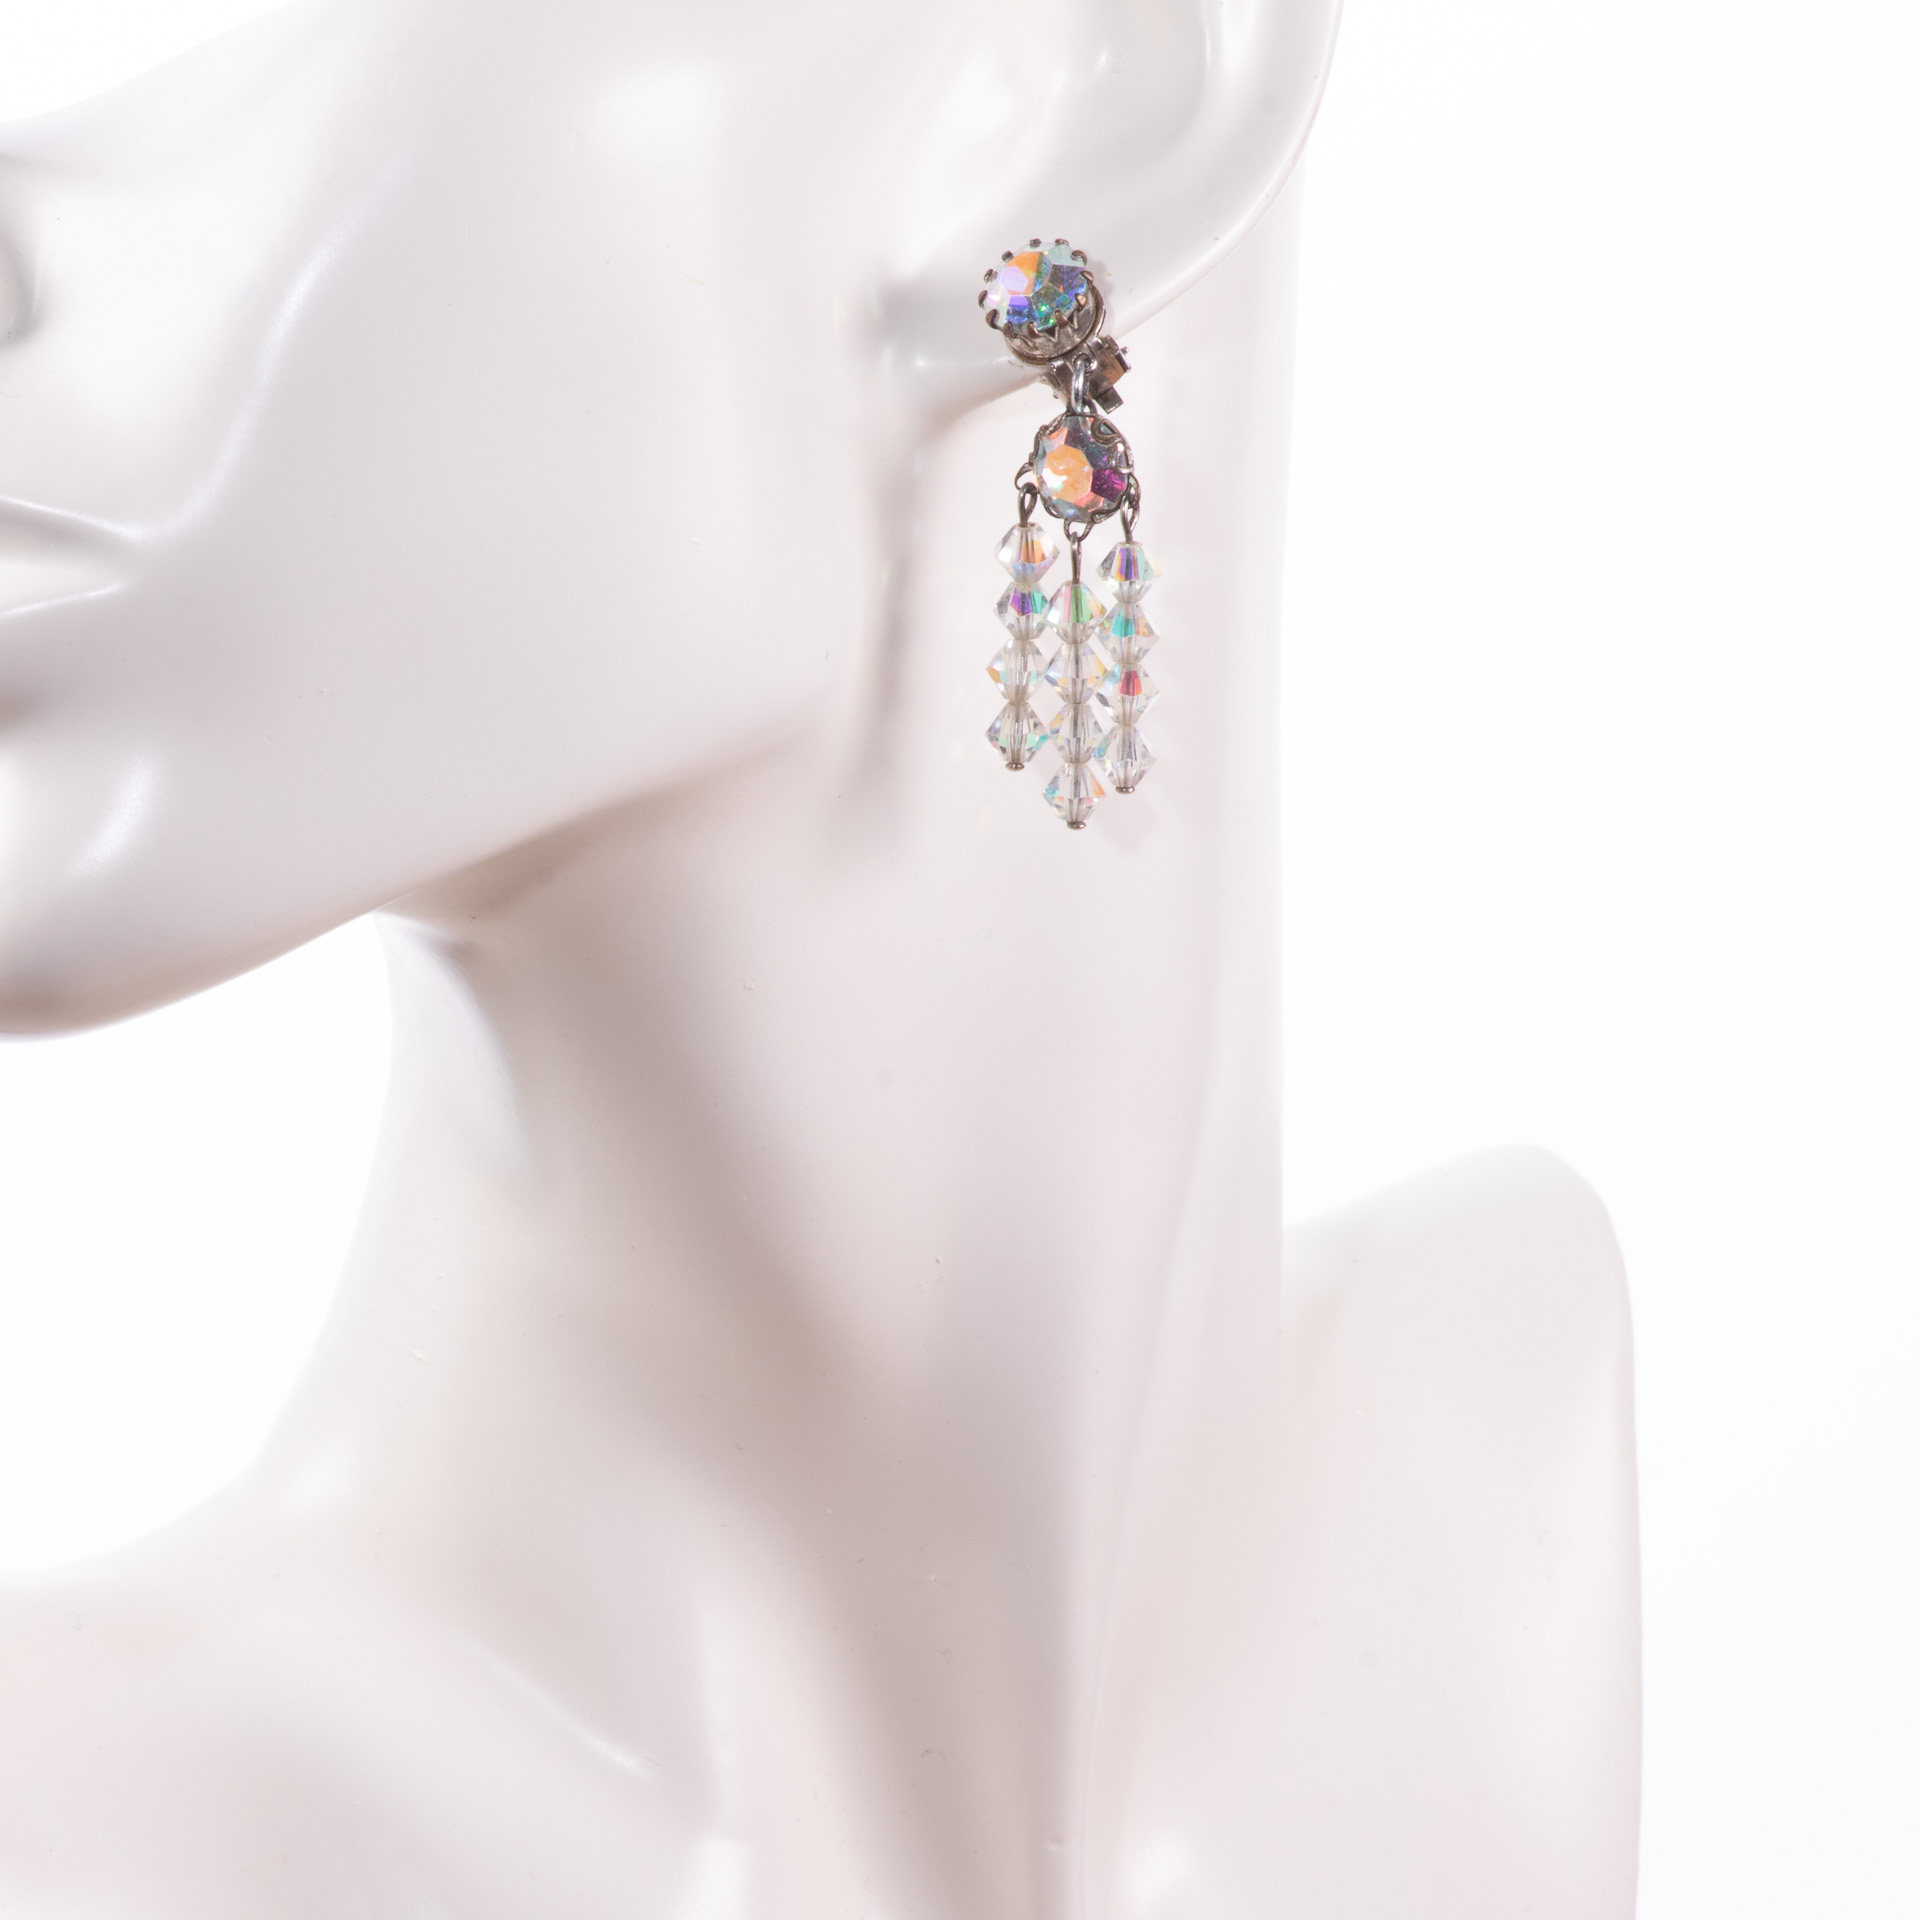 1960s Iridescent Rhinestone Earrings - Image 3 of 3